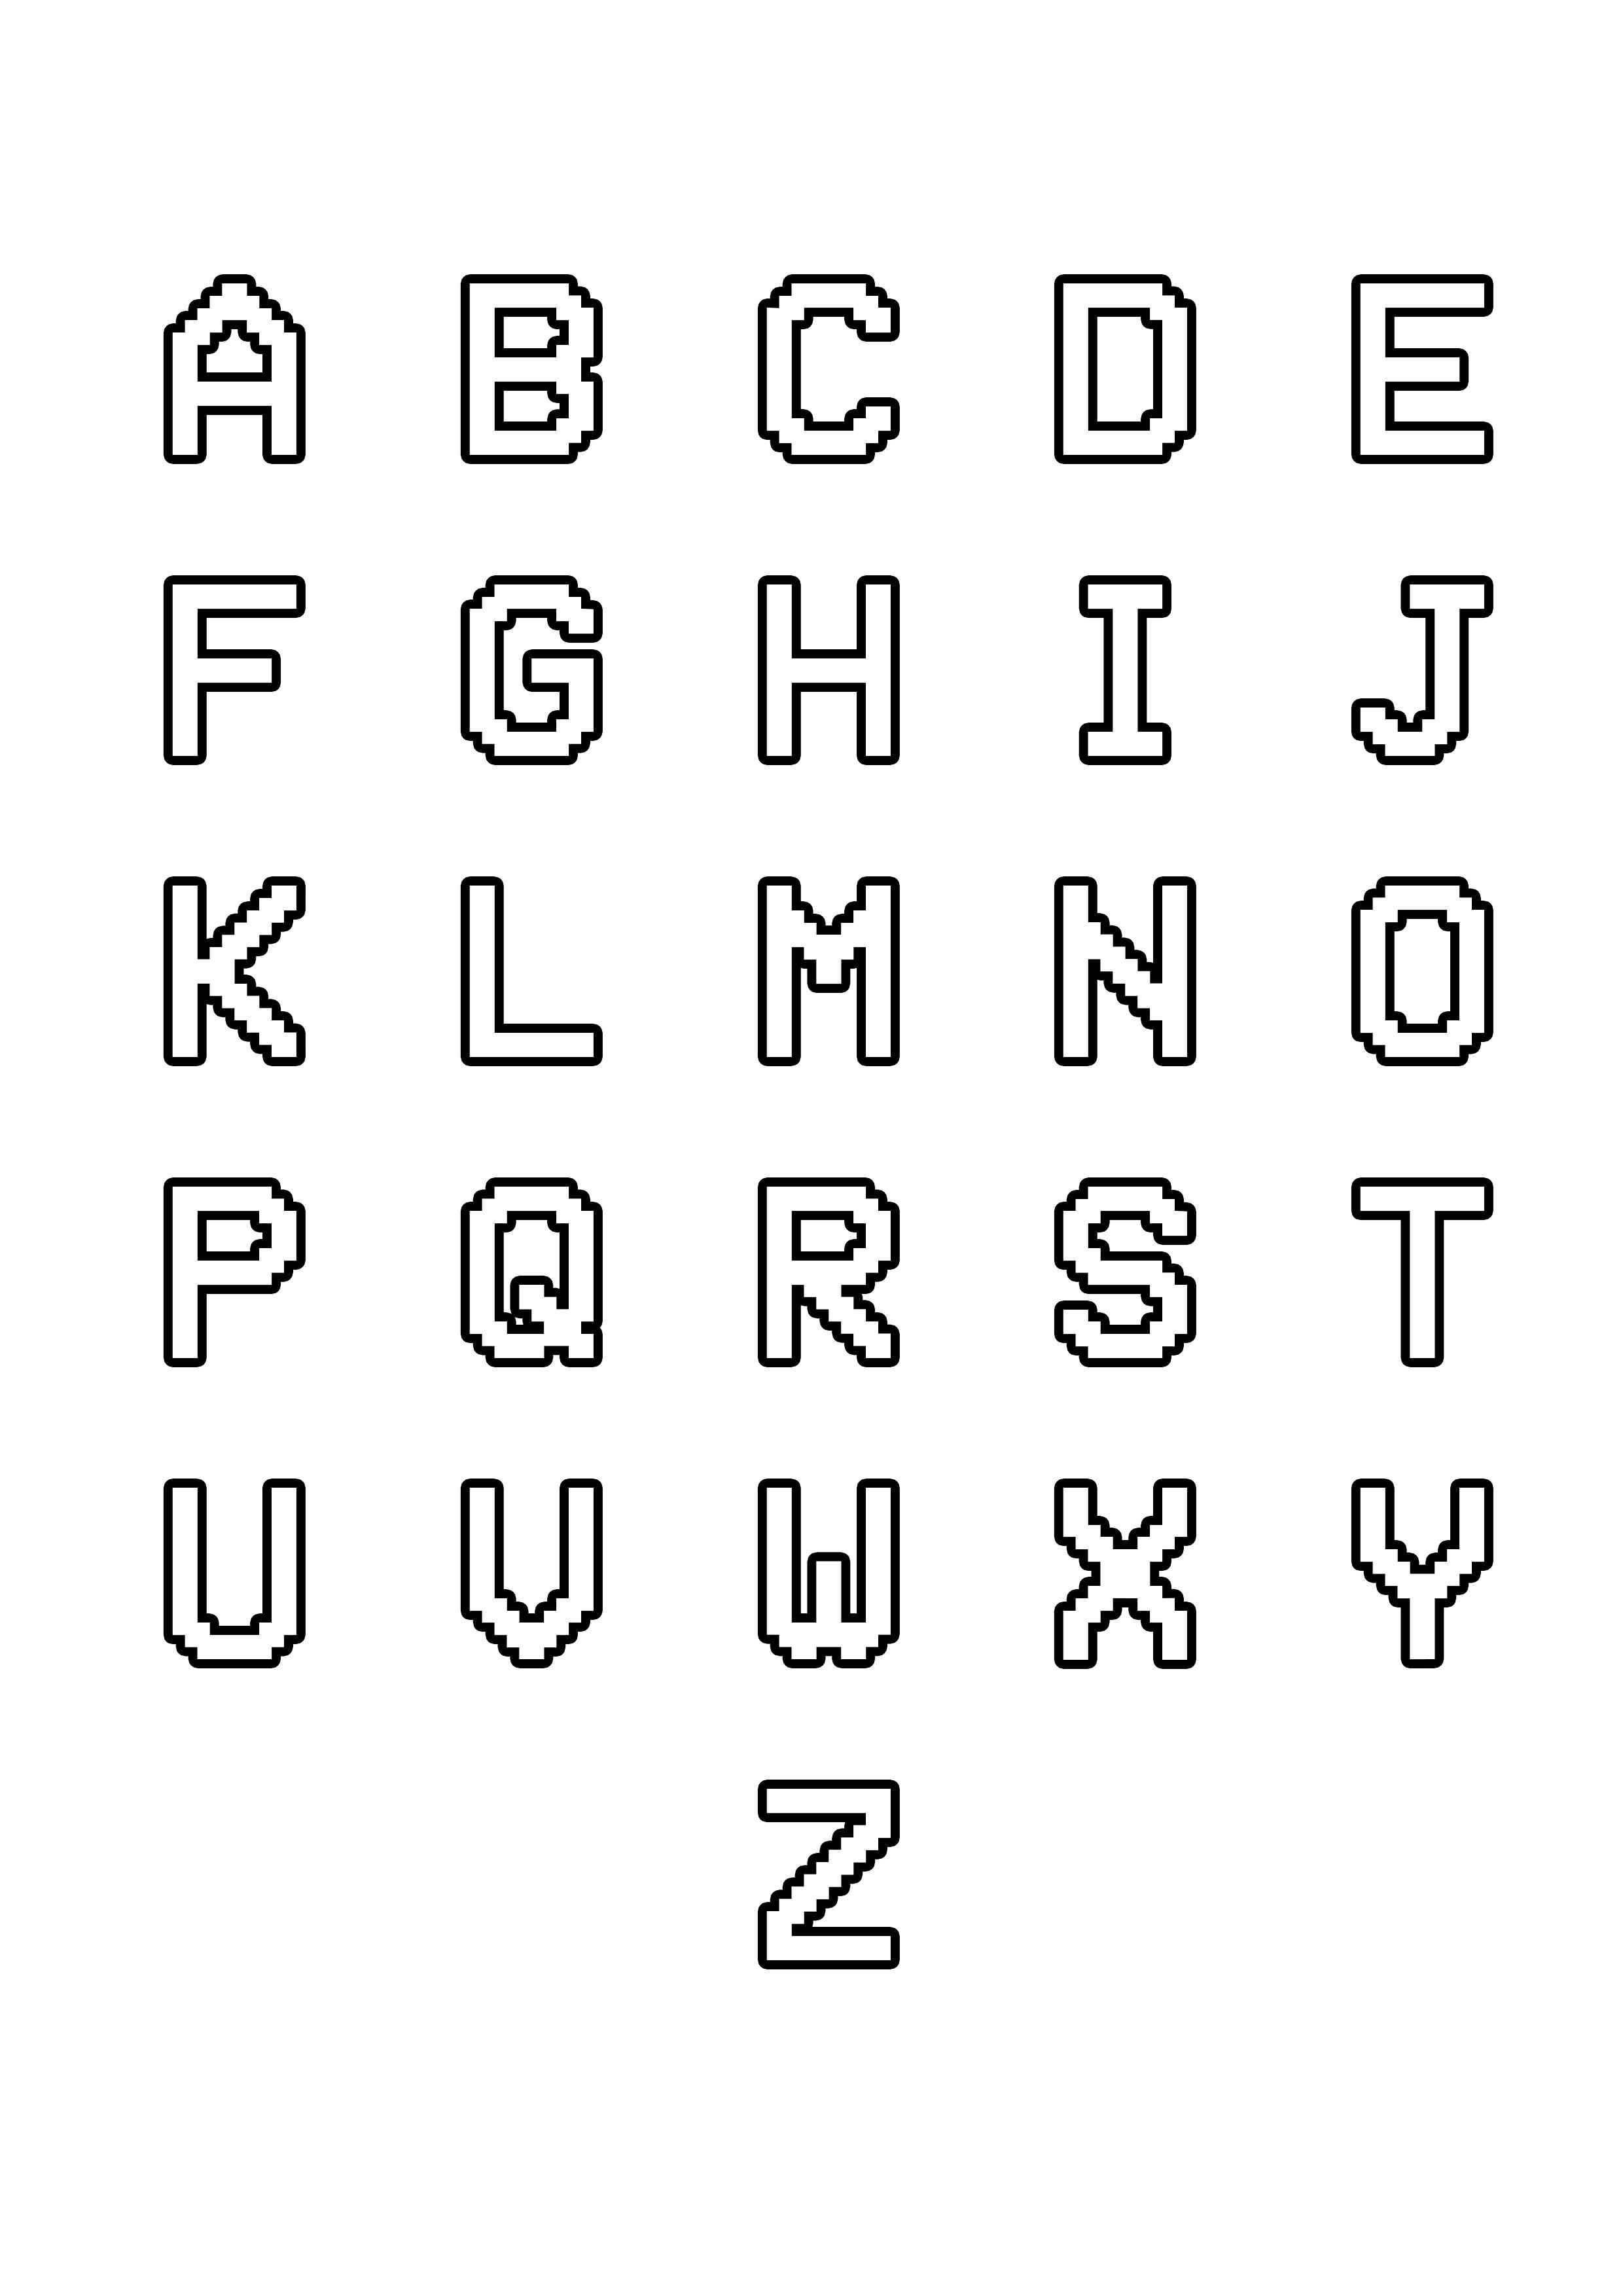 simple alphabet coloring pages | Simple alphabet 12 - Alphabet Coloring pages for kids to ...